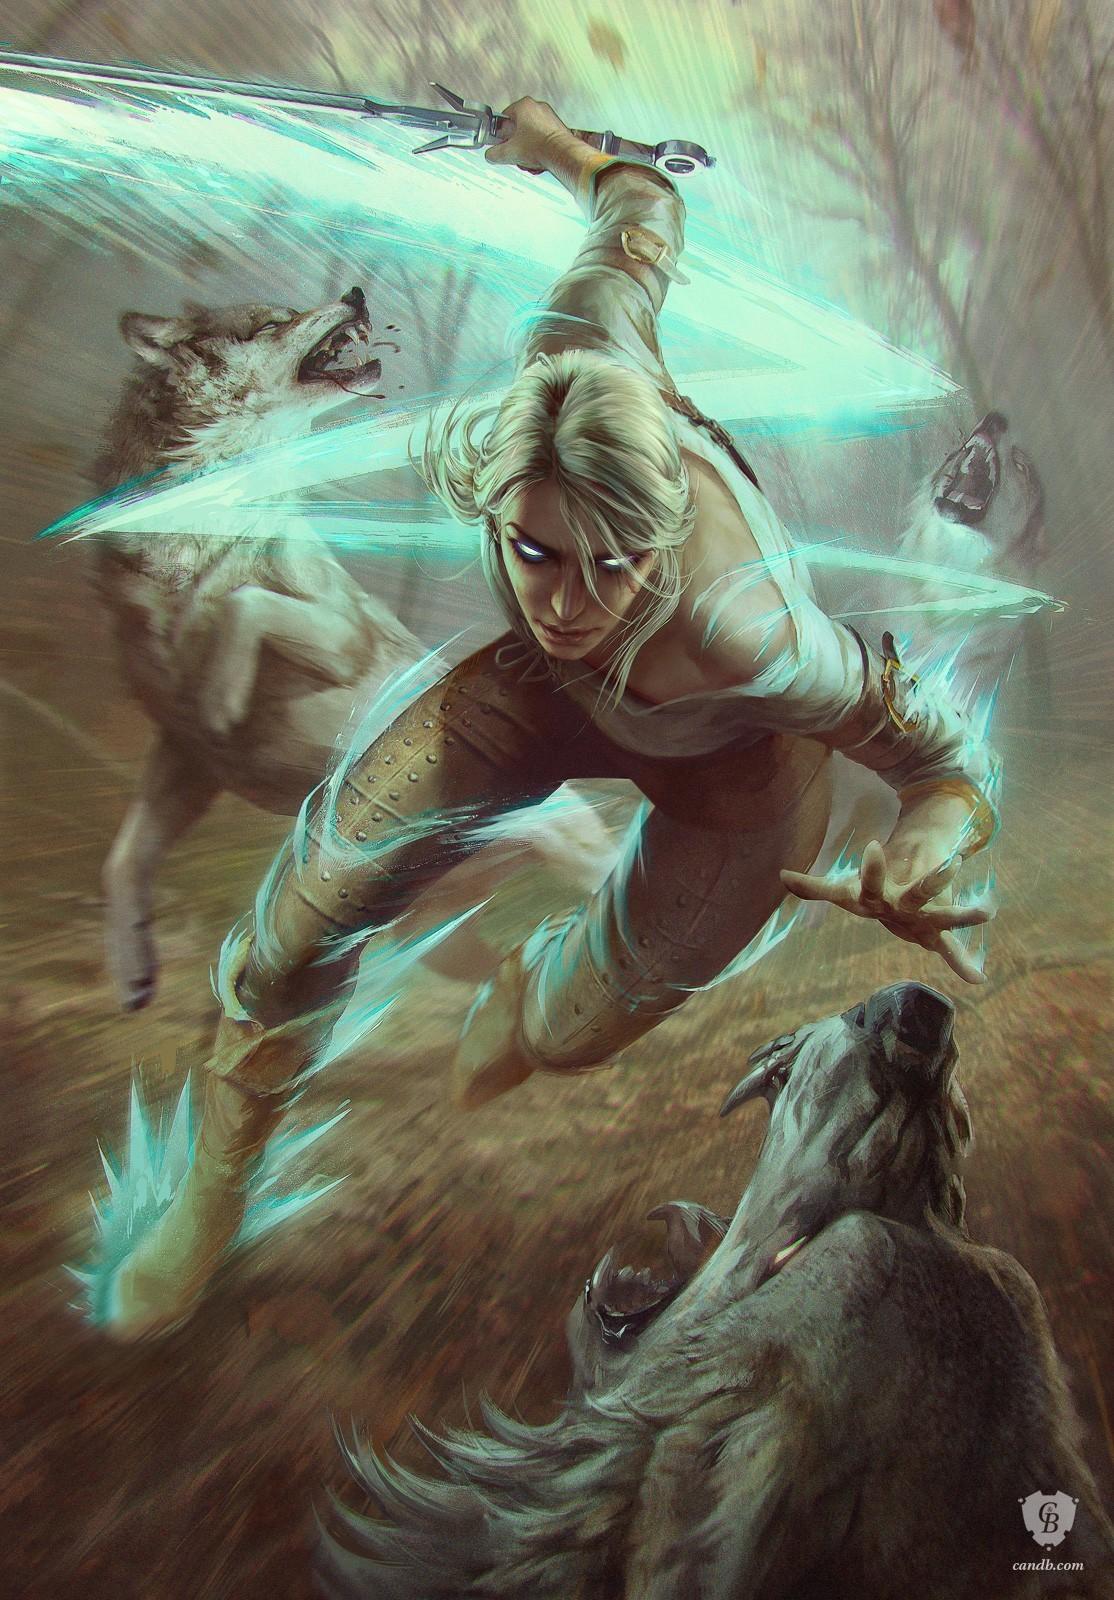 Ciri - Witcher 3: Wild Hunt, the